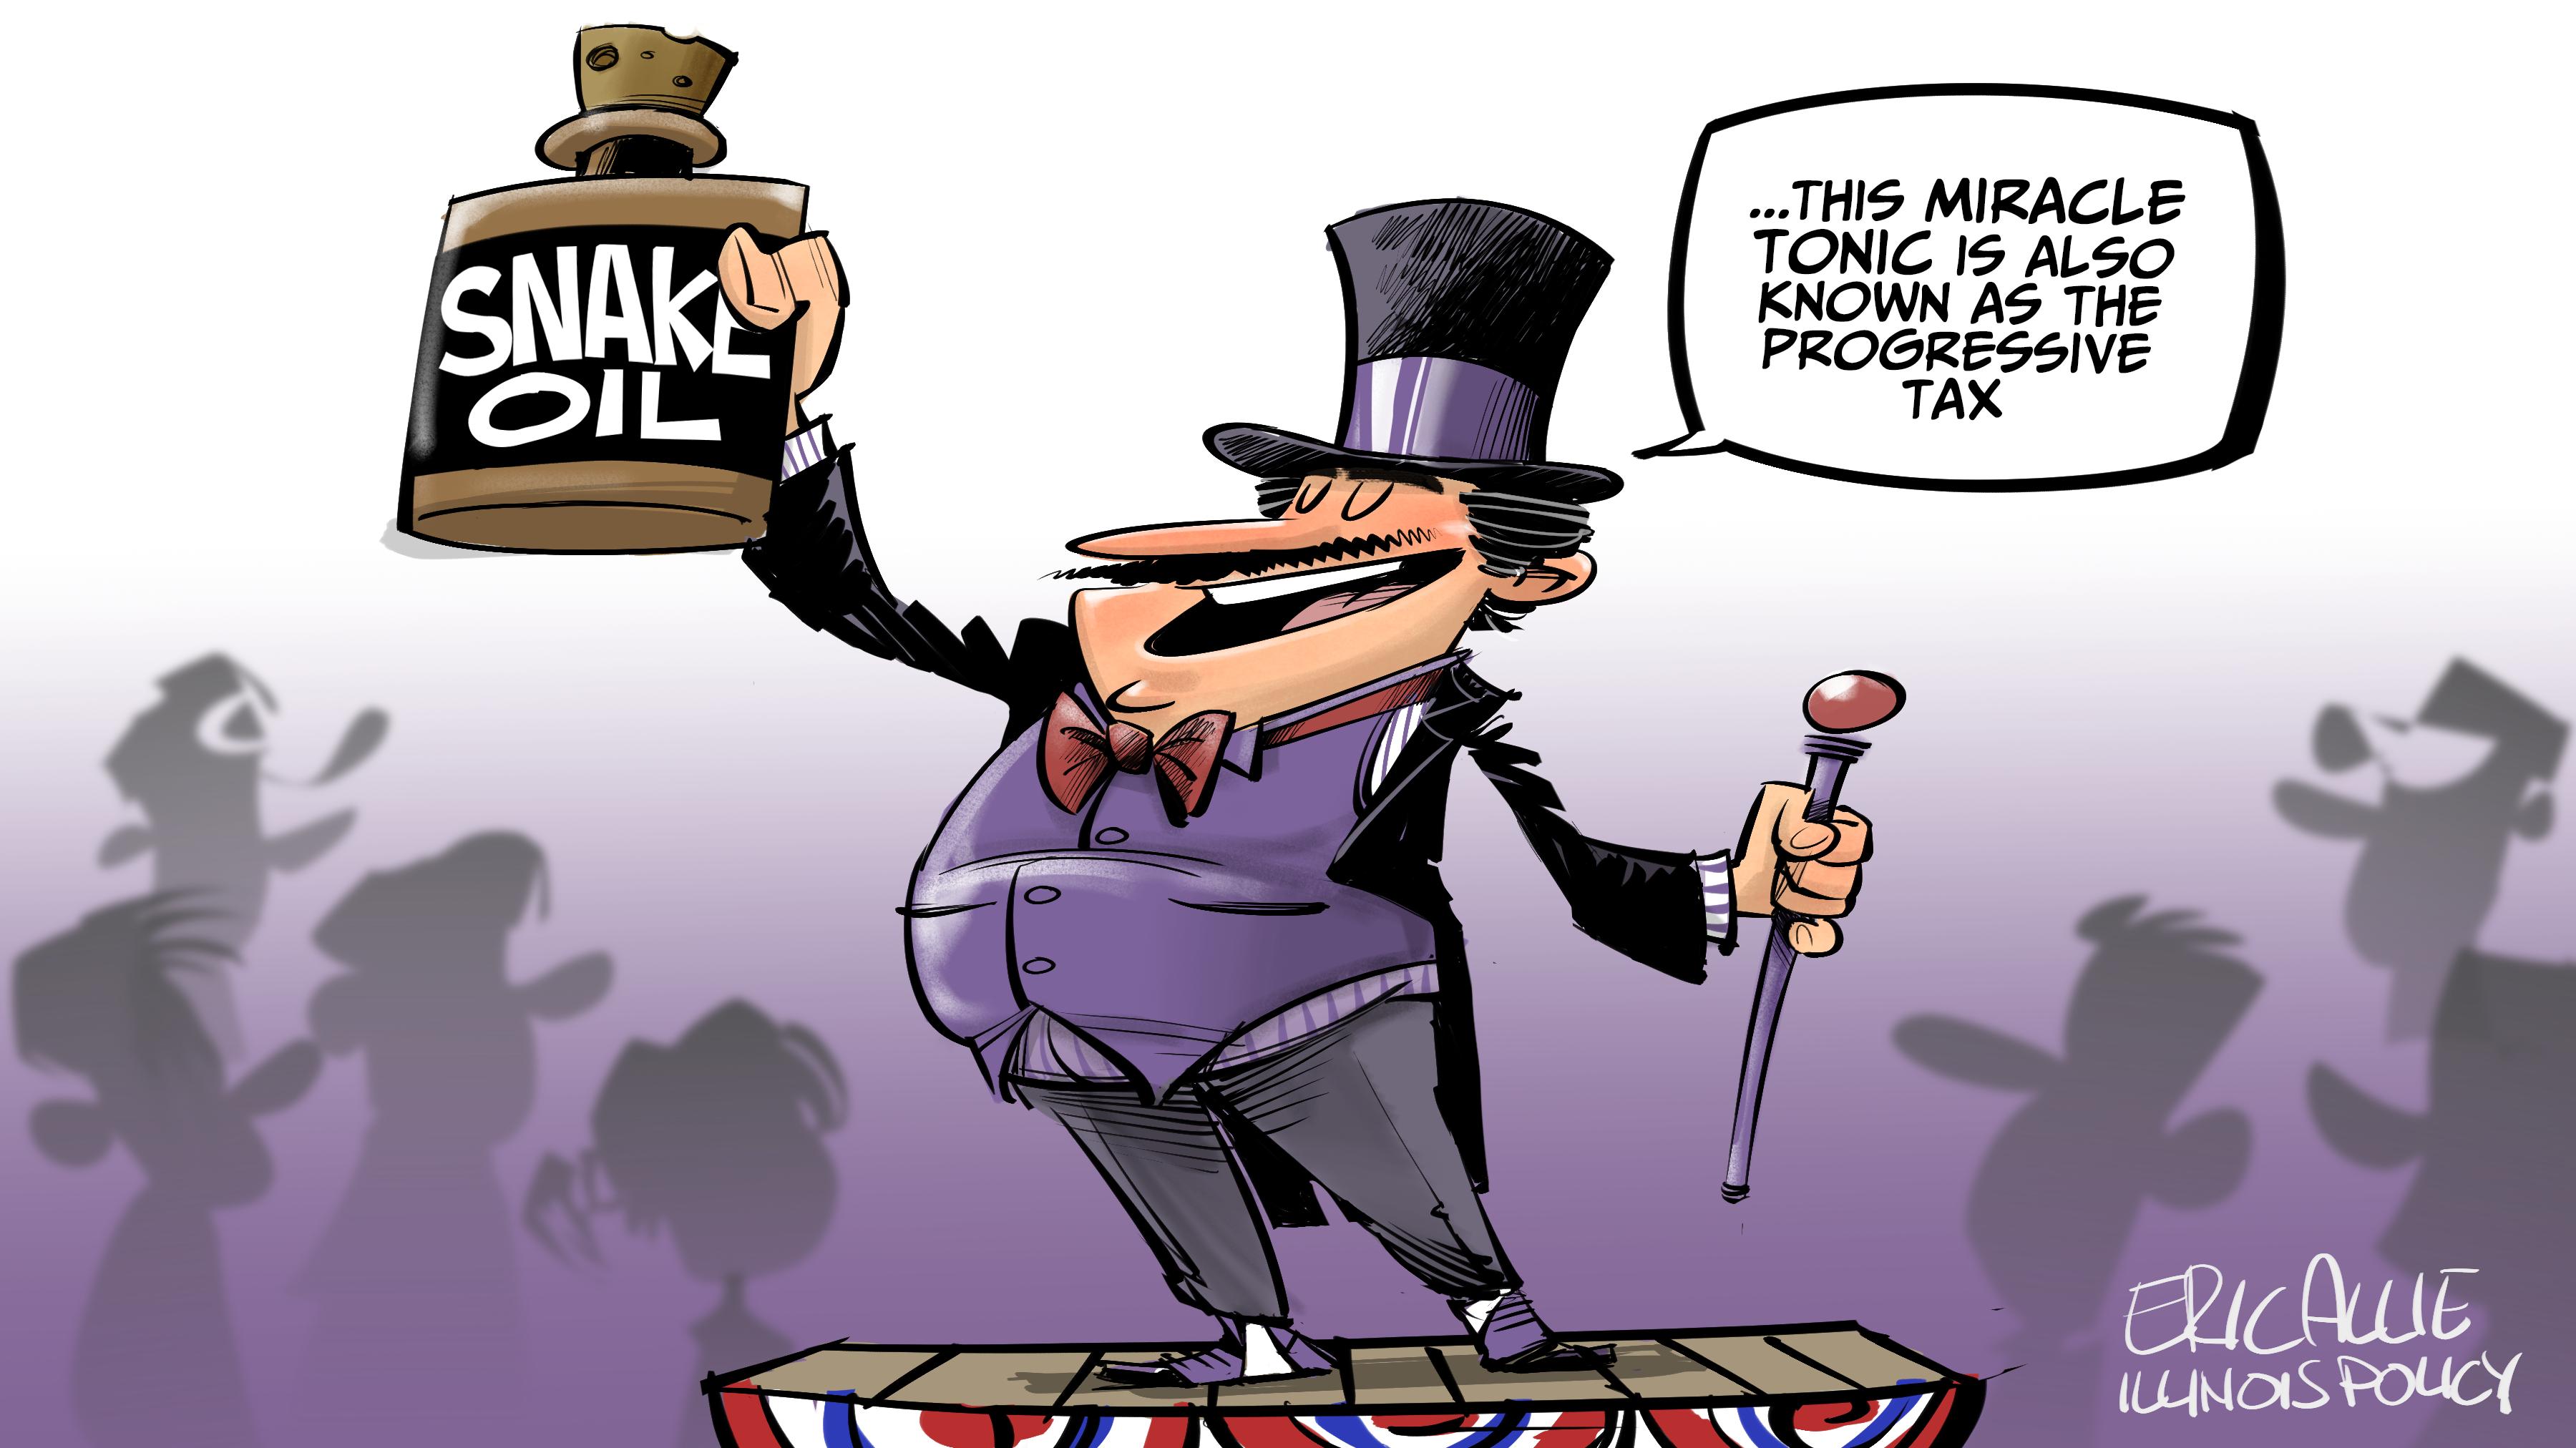 Progressive tax snake oil